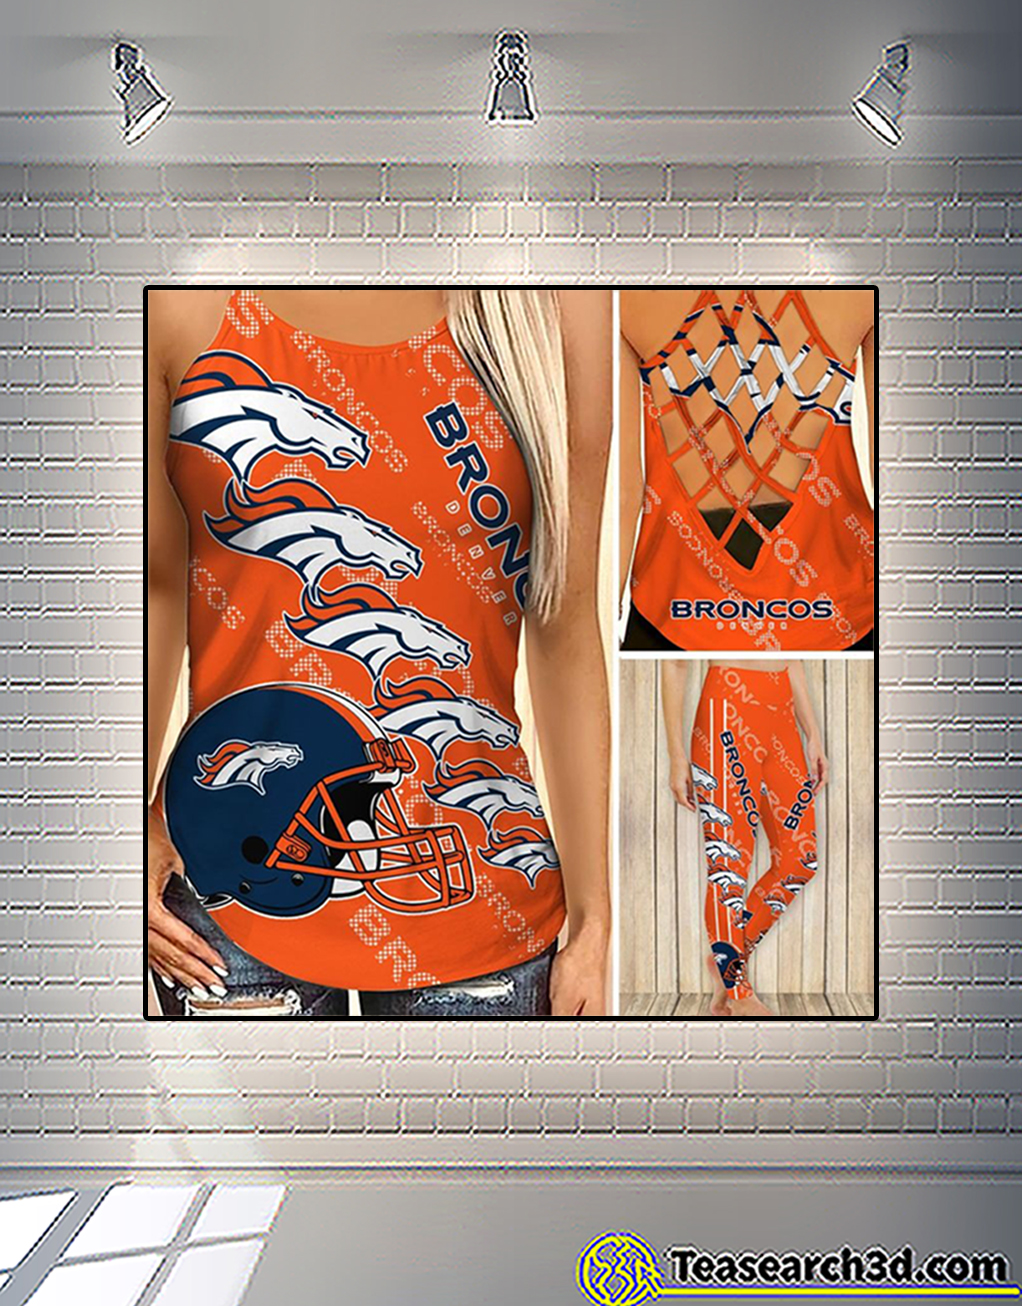 Denver broncos criss cross tank top and leggings